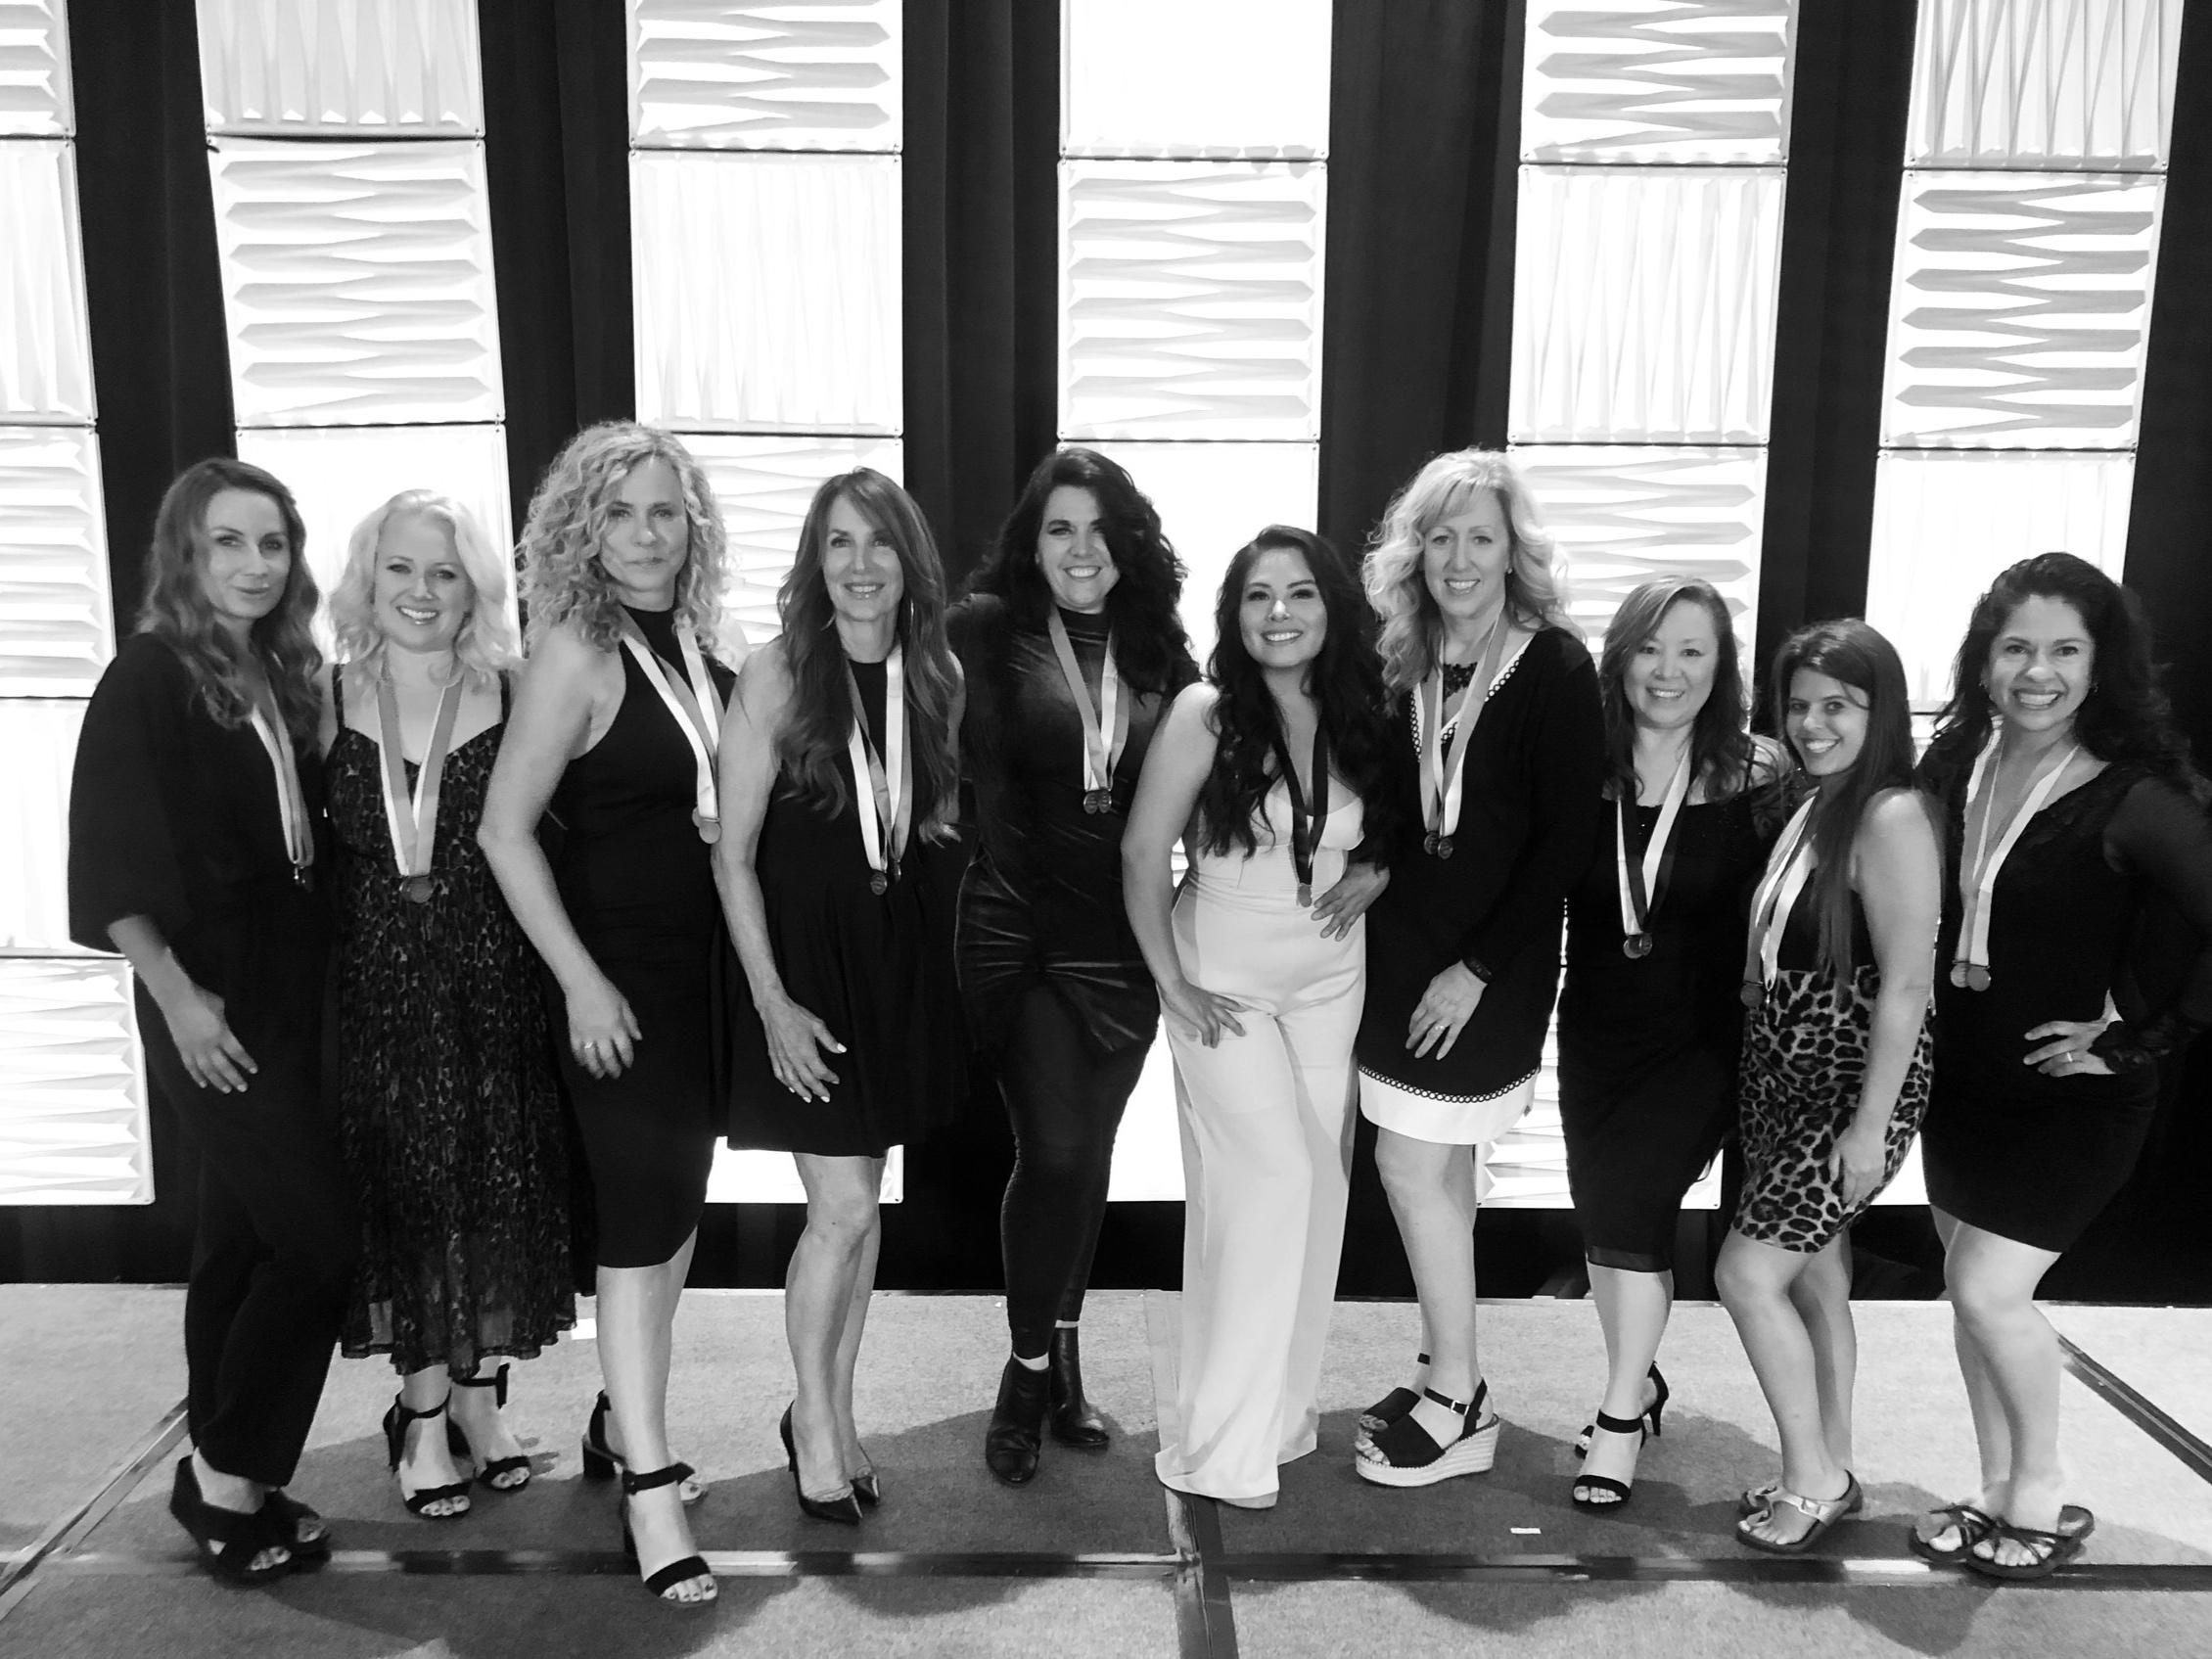 L to R: Lenka Jones, Michelle Taylor, Ann Landstrom, Kitti McMeel, myself, Saray Tylor Roman, Tammy Zurak, Bethany Johs, Ashleigh Taylor Henning, Rosaura Sandoval